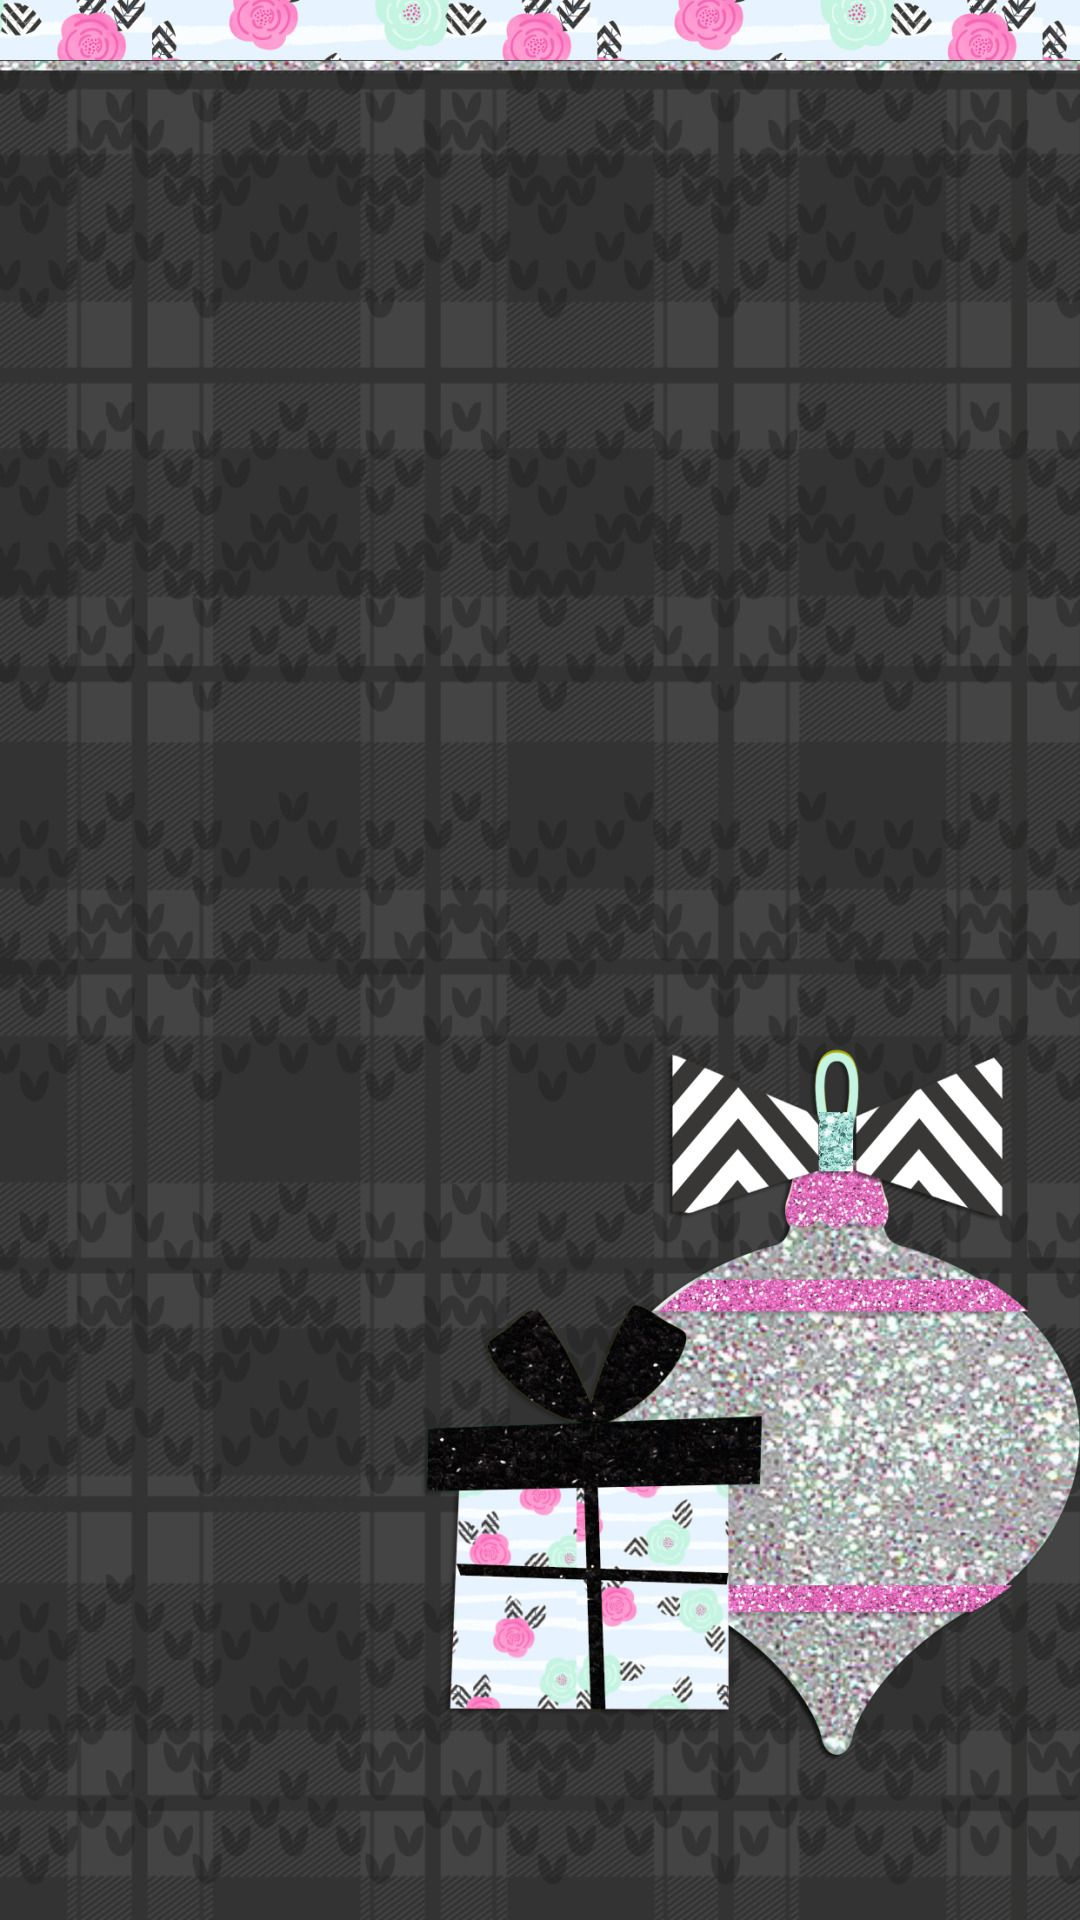 Celestekawaii Cell Phone Wallpapersdesktop Wallpapers O Kitty Wallpaperdesigner